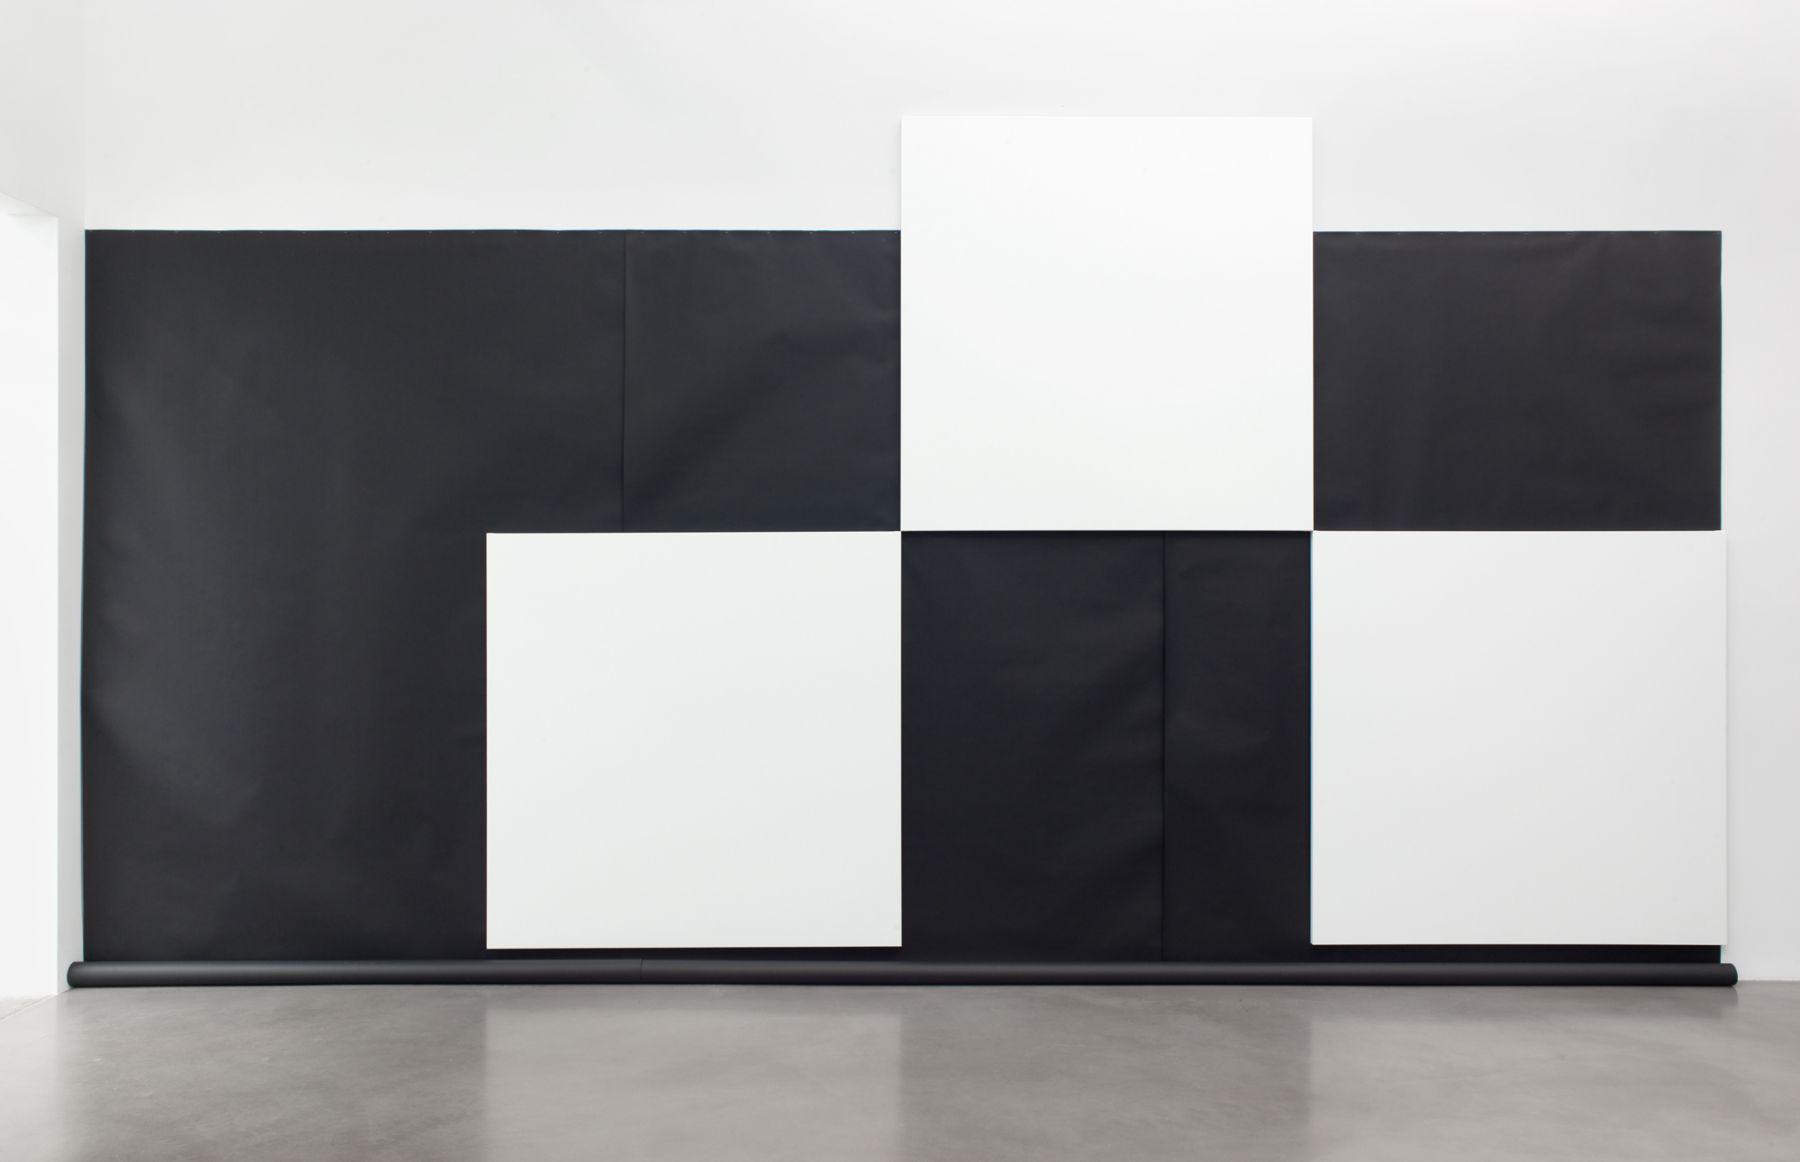 Heimo Zobernig, Untitled